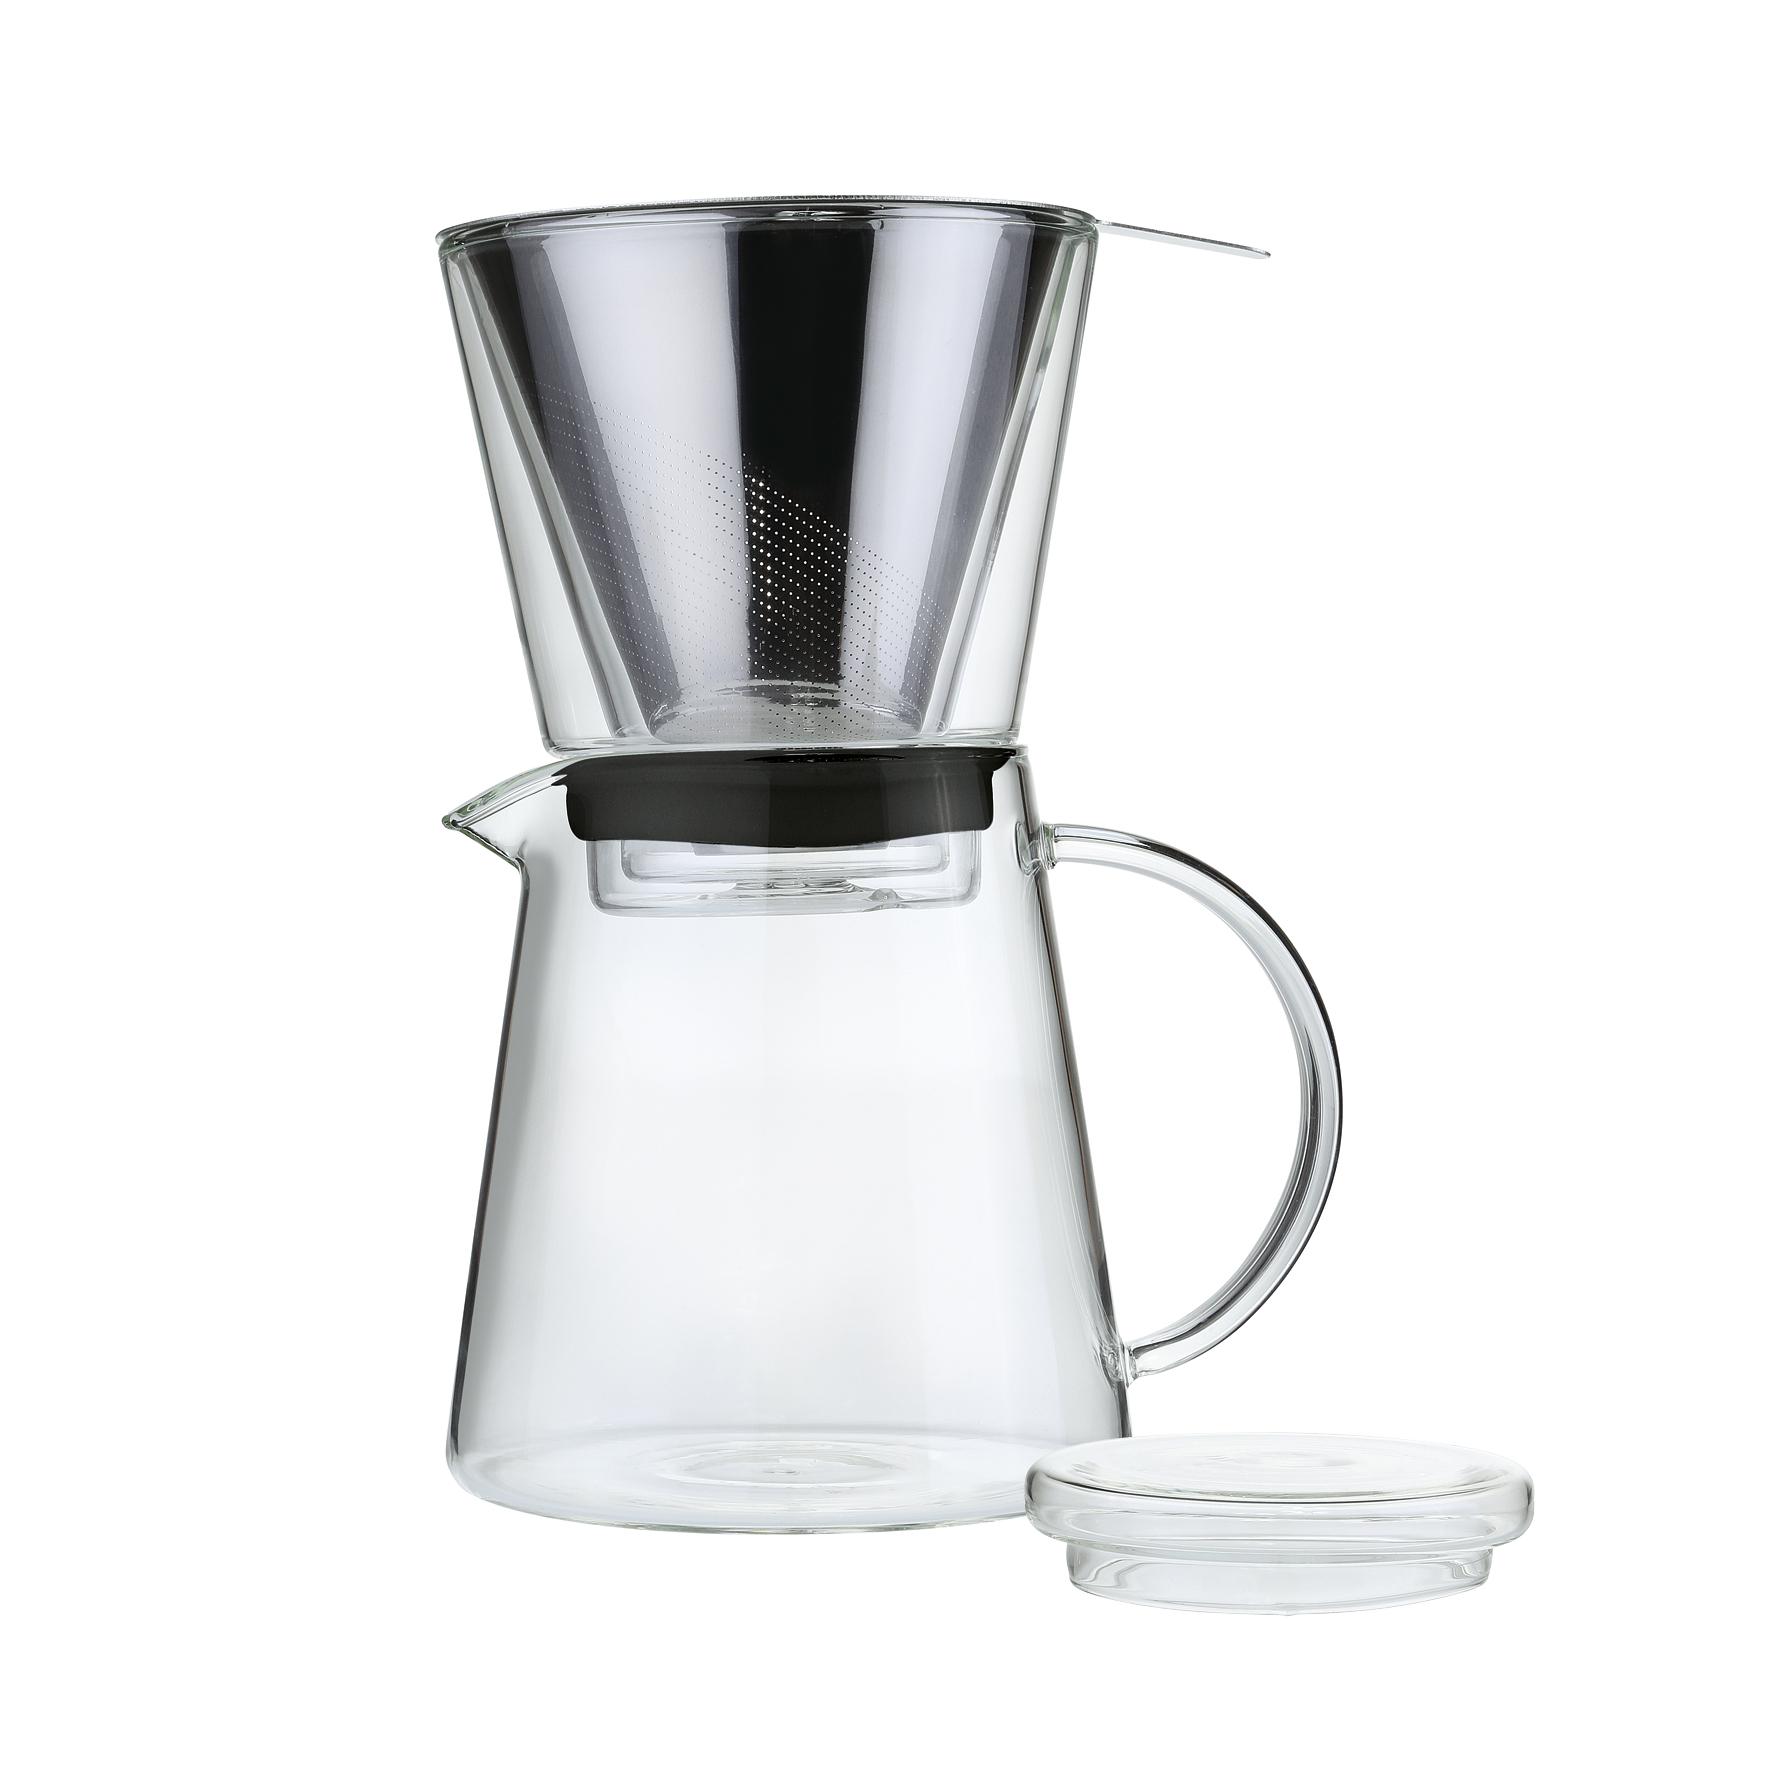 Zassenhaus Borosilicate Glass 25.5 Ounce Pour-Over Brewer